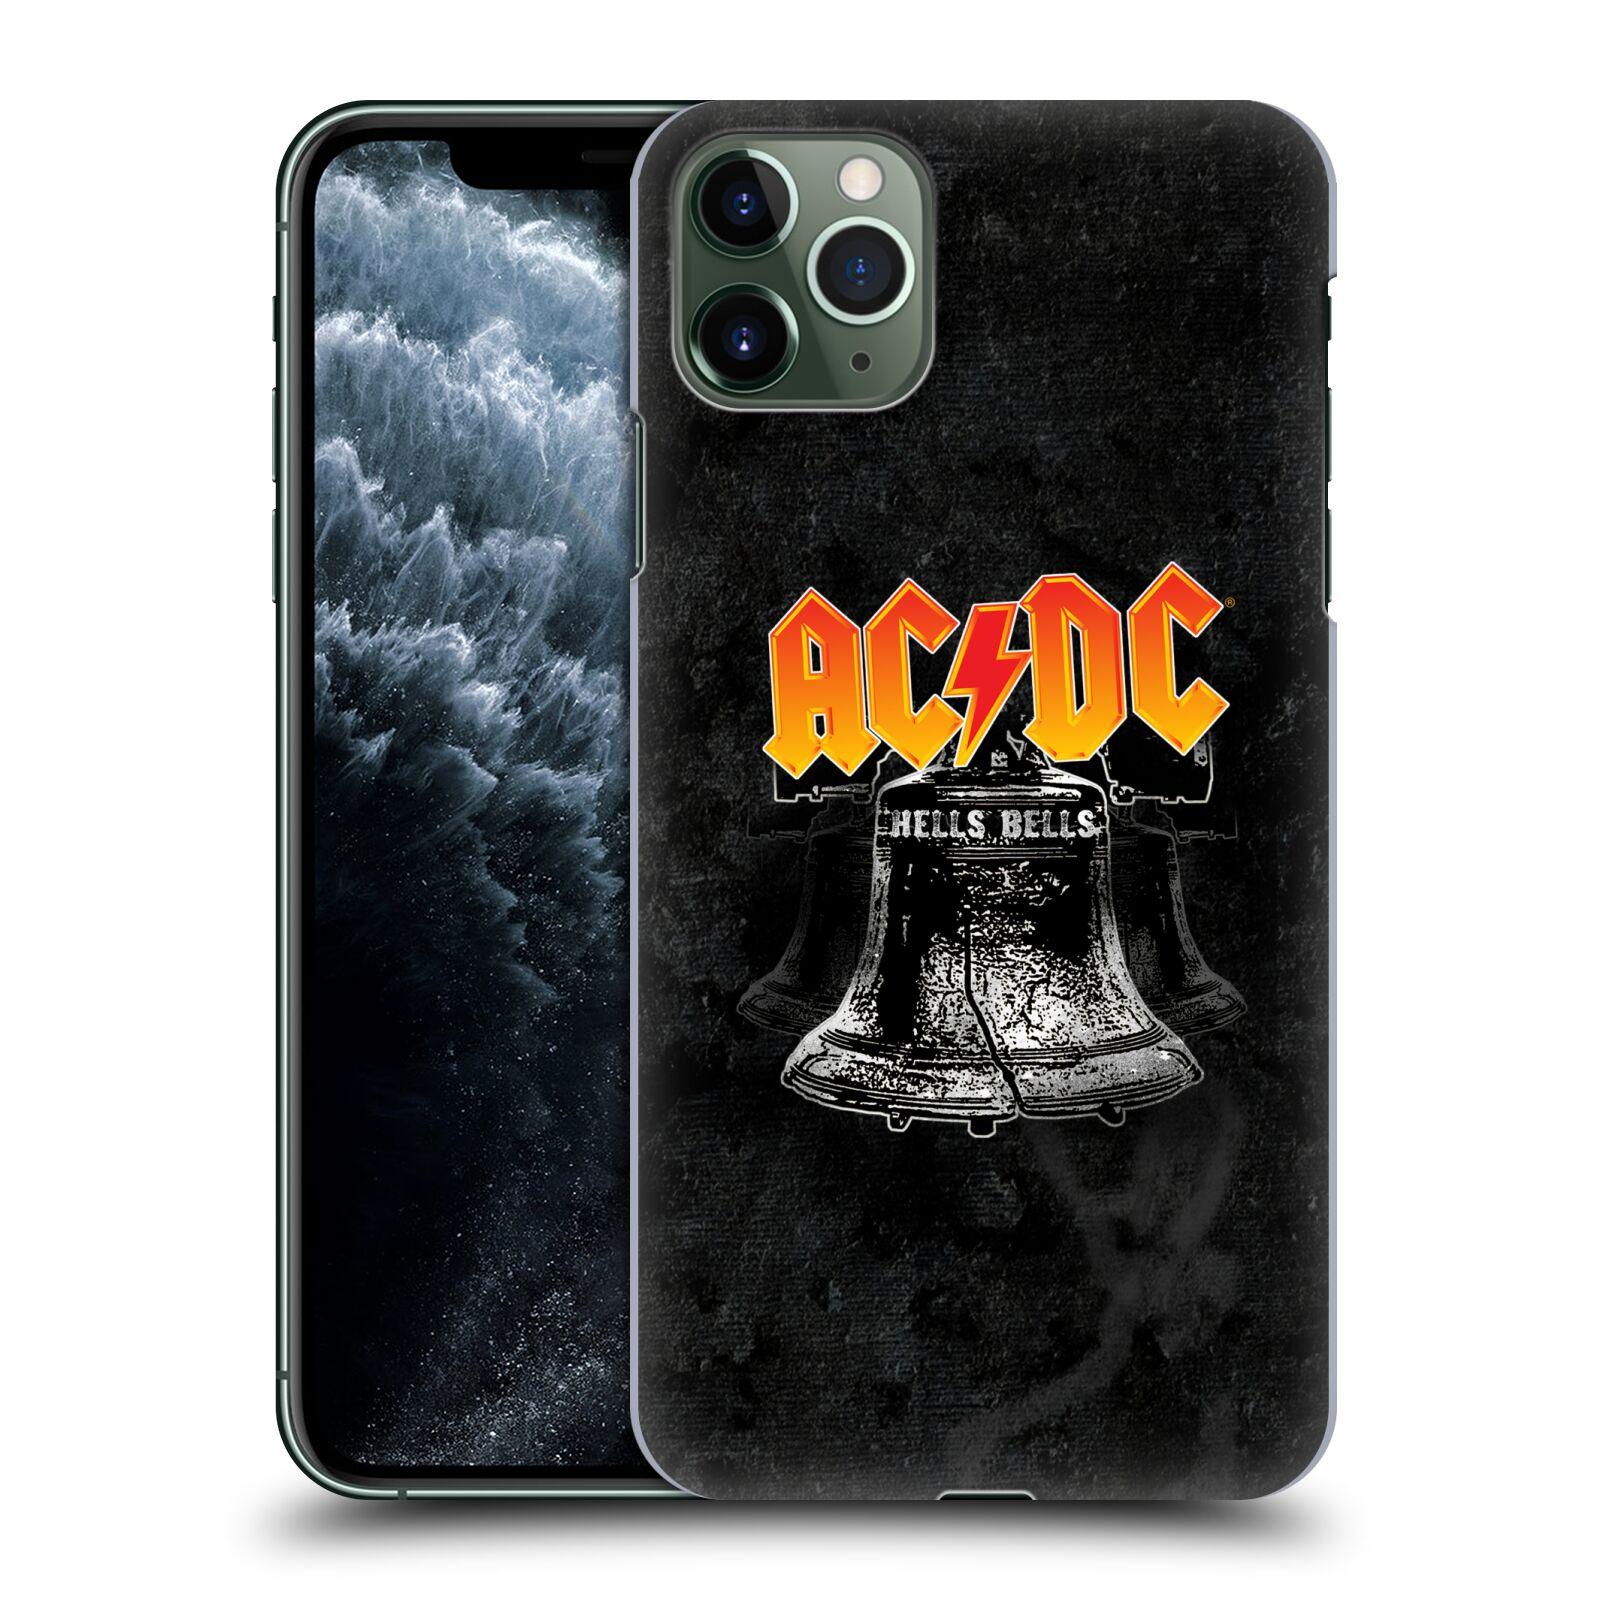 Plastové pouzdro na mobil Apple iPhone 11 Pro Max - Head Case - AC/DC Hells Bells